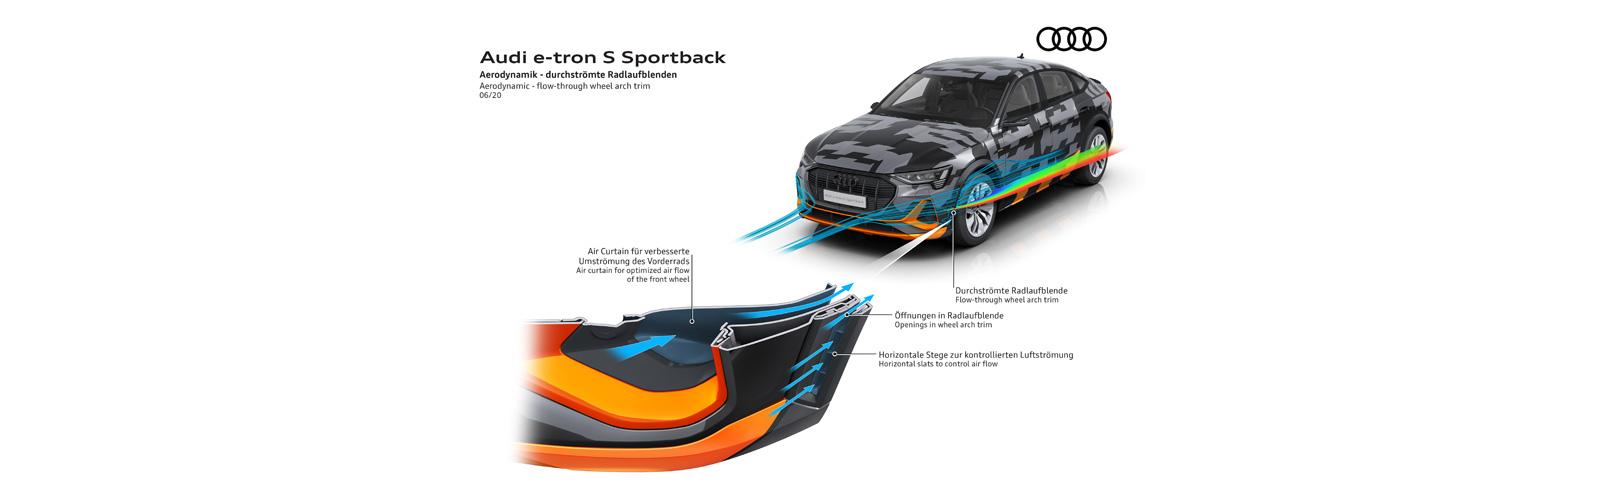 Audi e-tron S Sportback prototype offers 0.26 drag coefficient